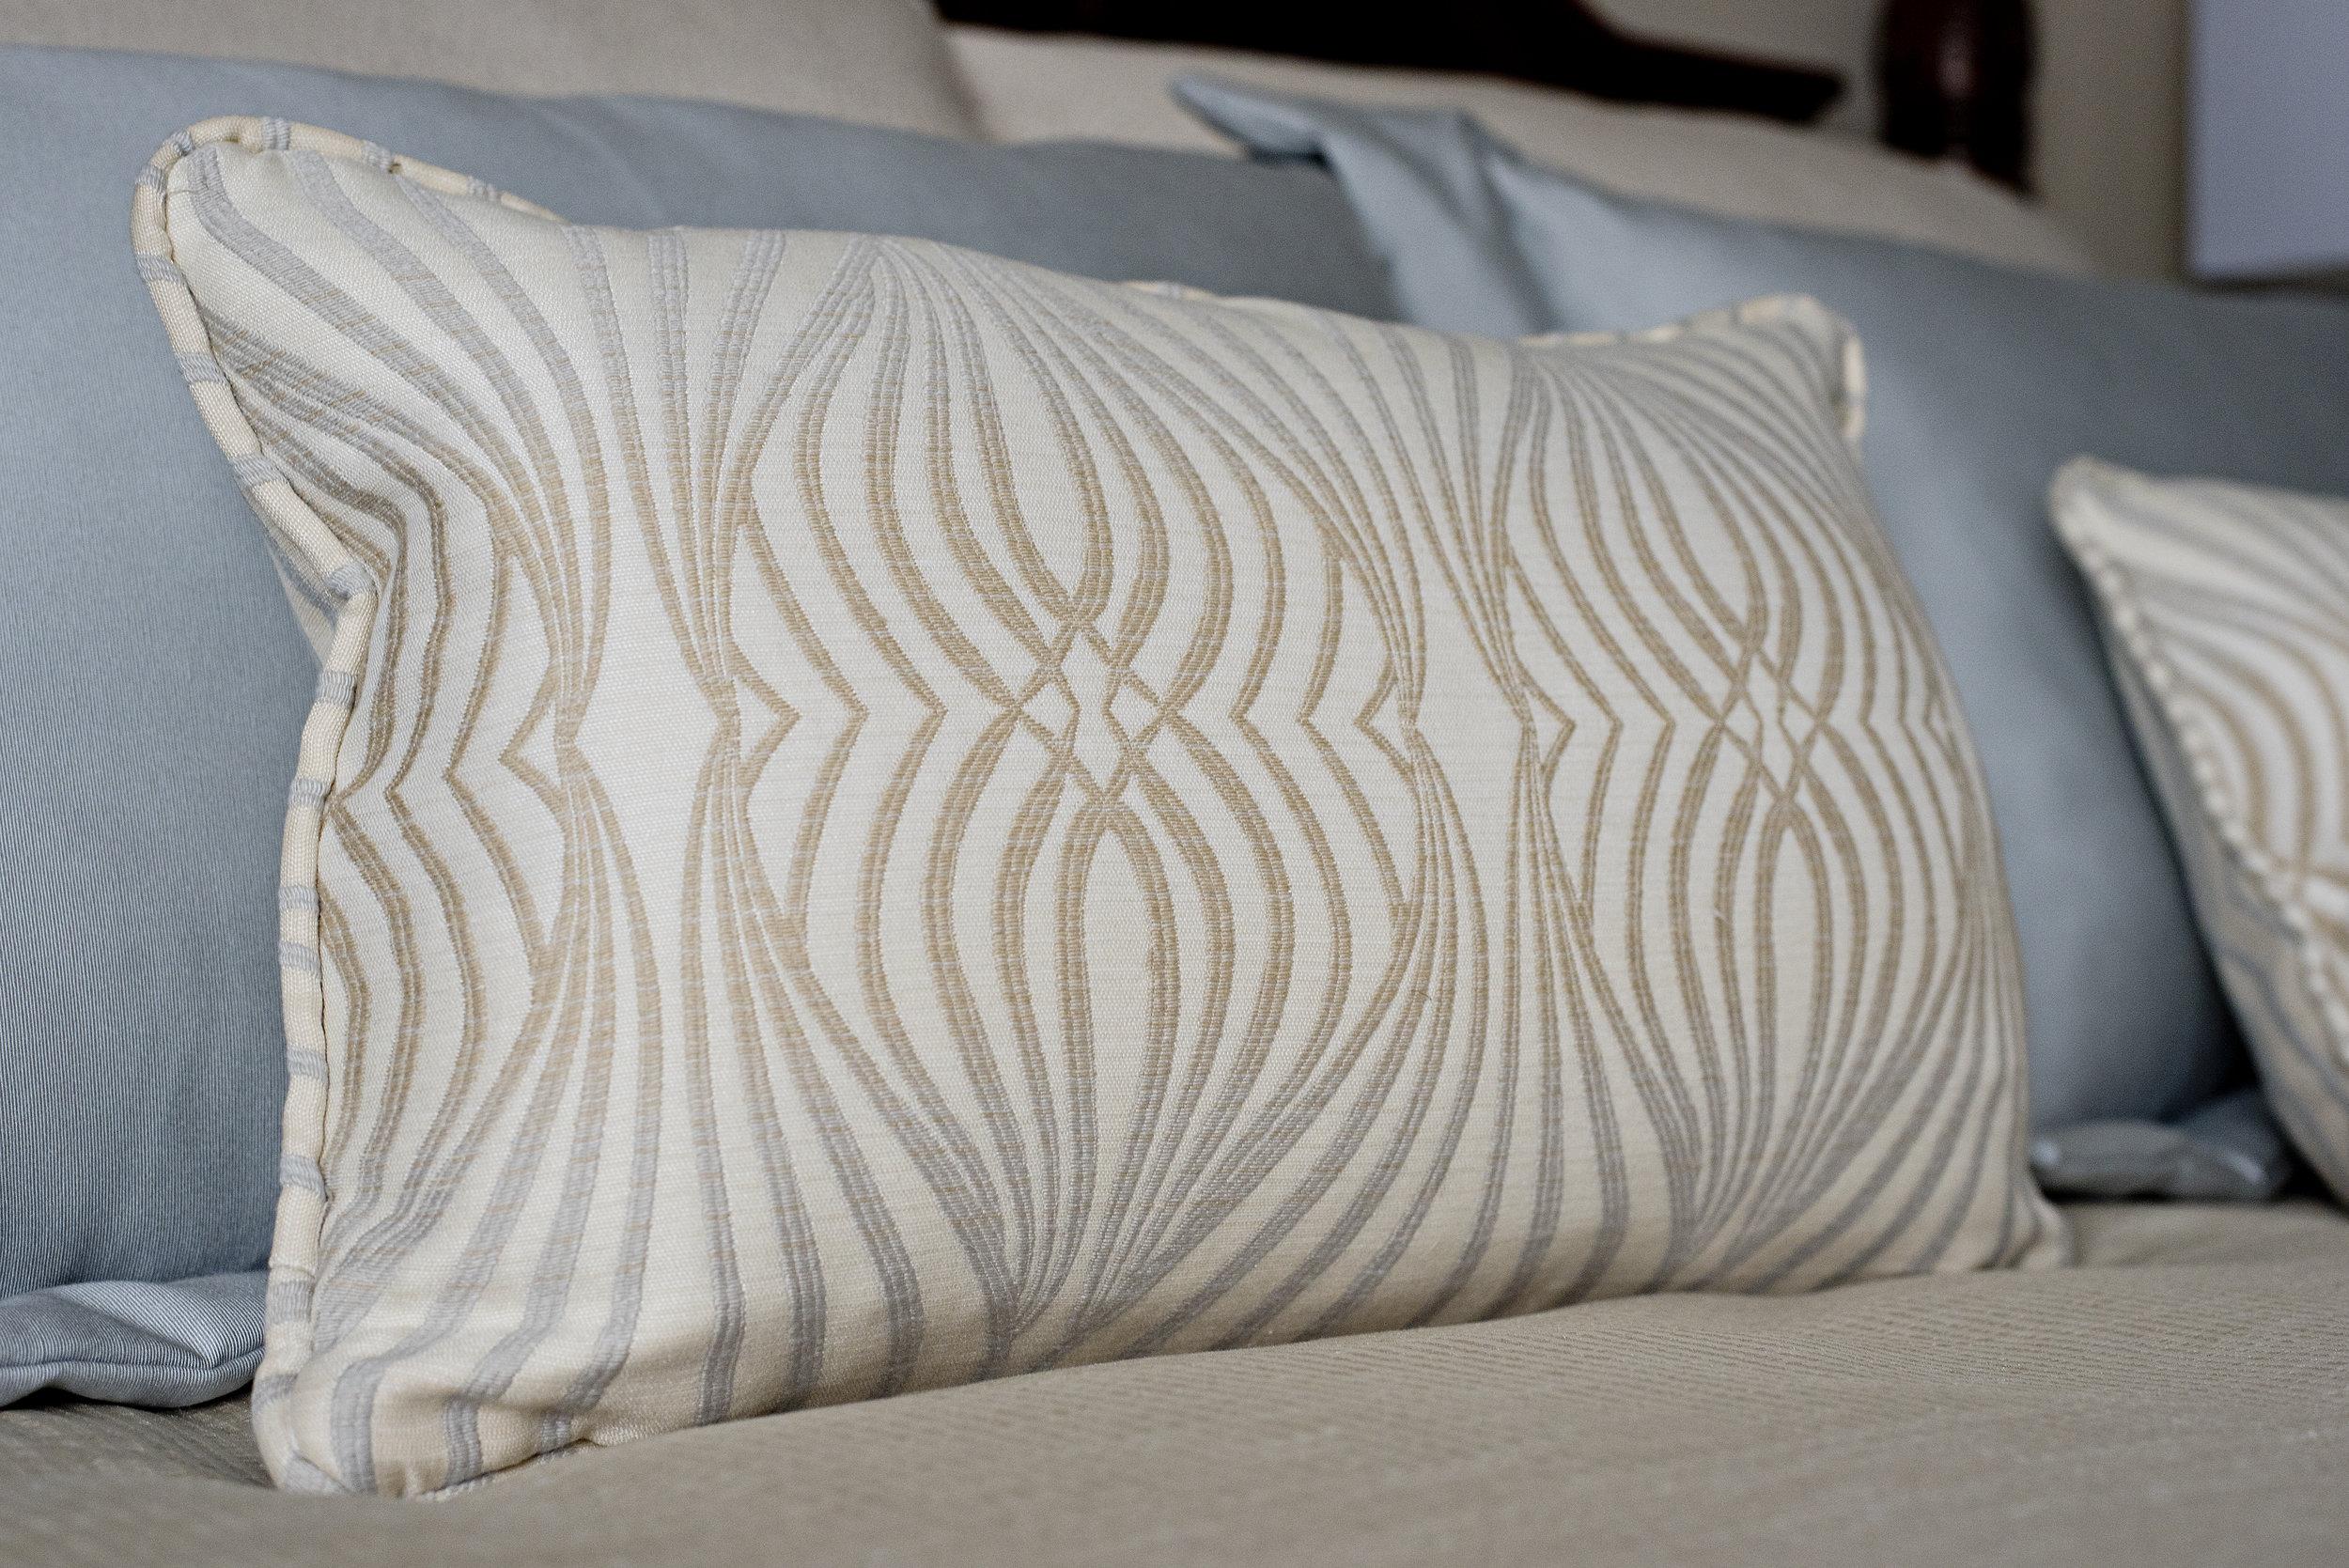 decorative simple wave pattern design beige and blue toss cushion bedding soft colour palette decor accessories.jpg